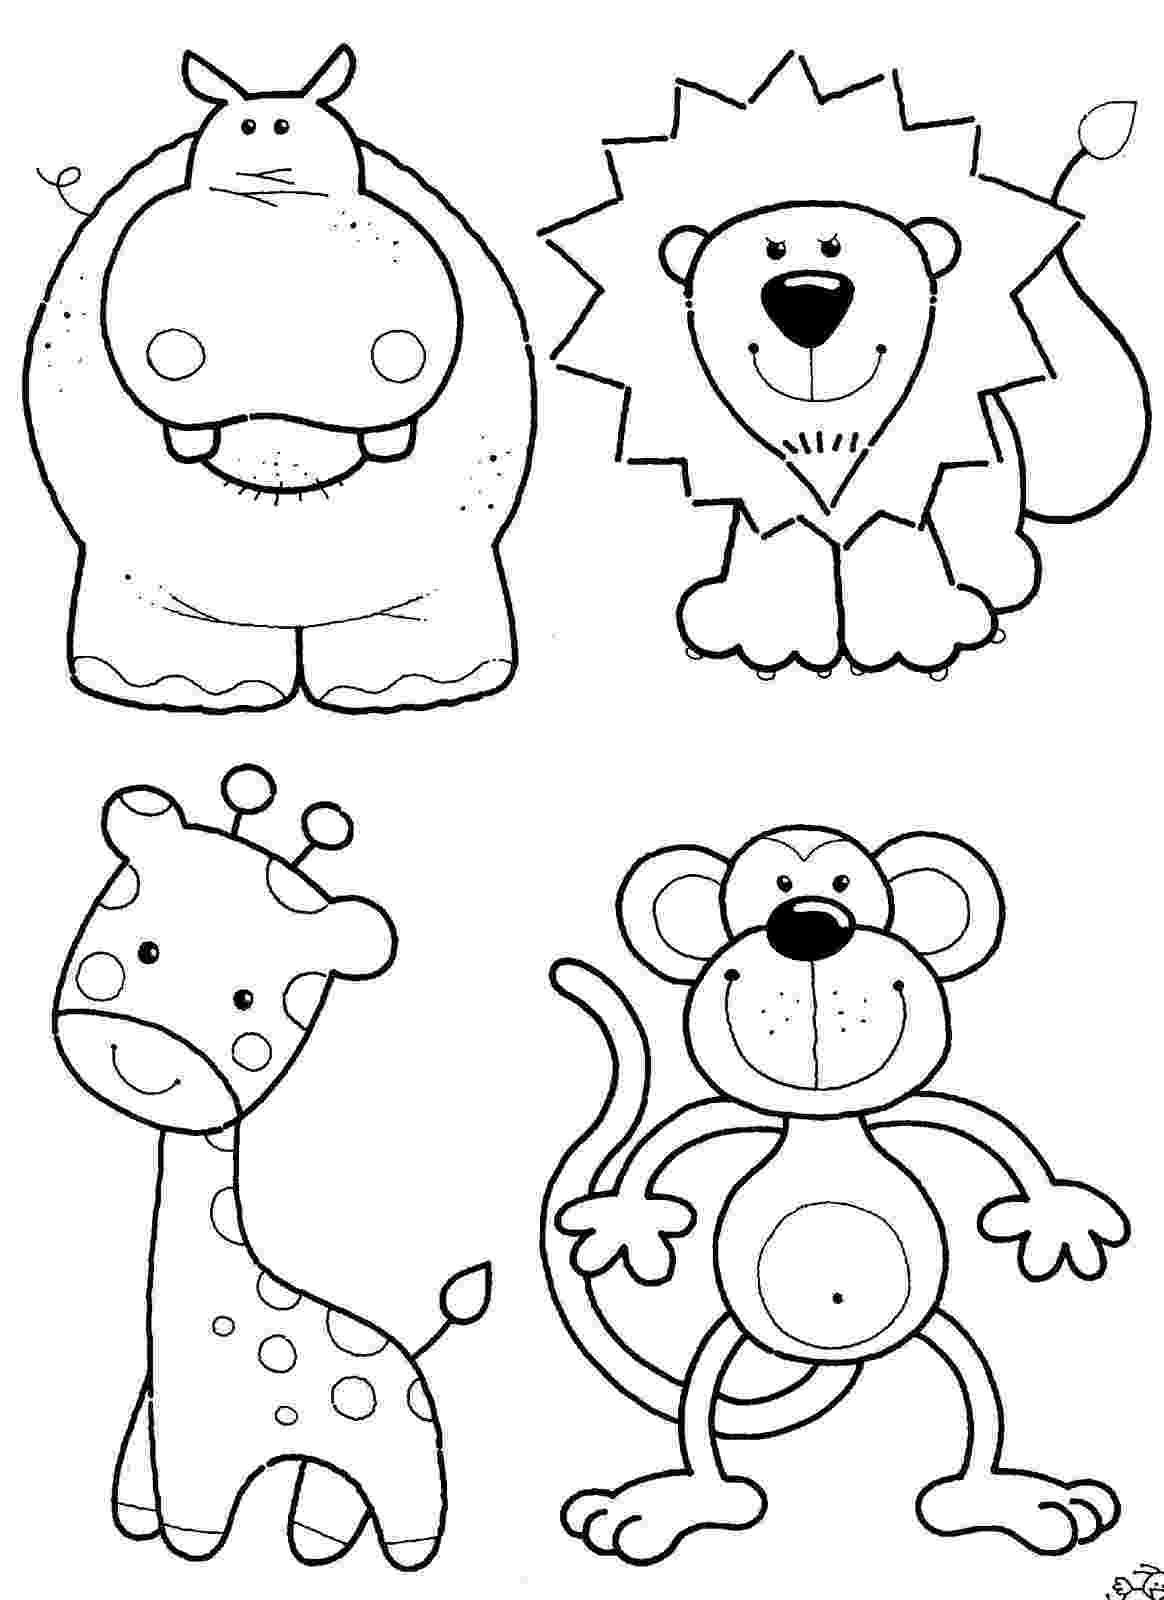 printable coloring pages of animals safari animals coloring pages getcoloringpagescom animals coloring pages printable of